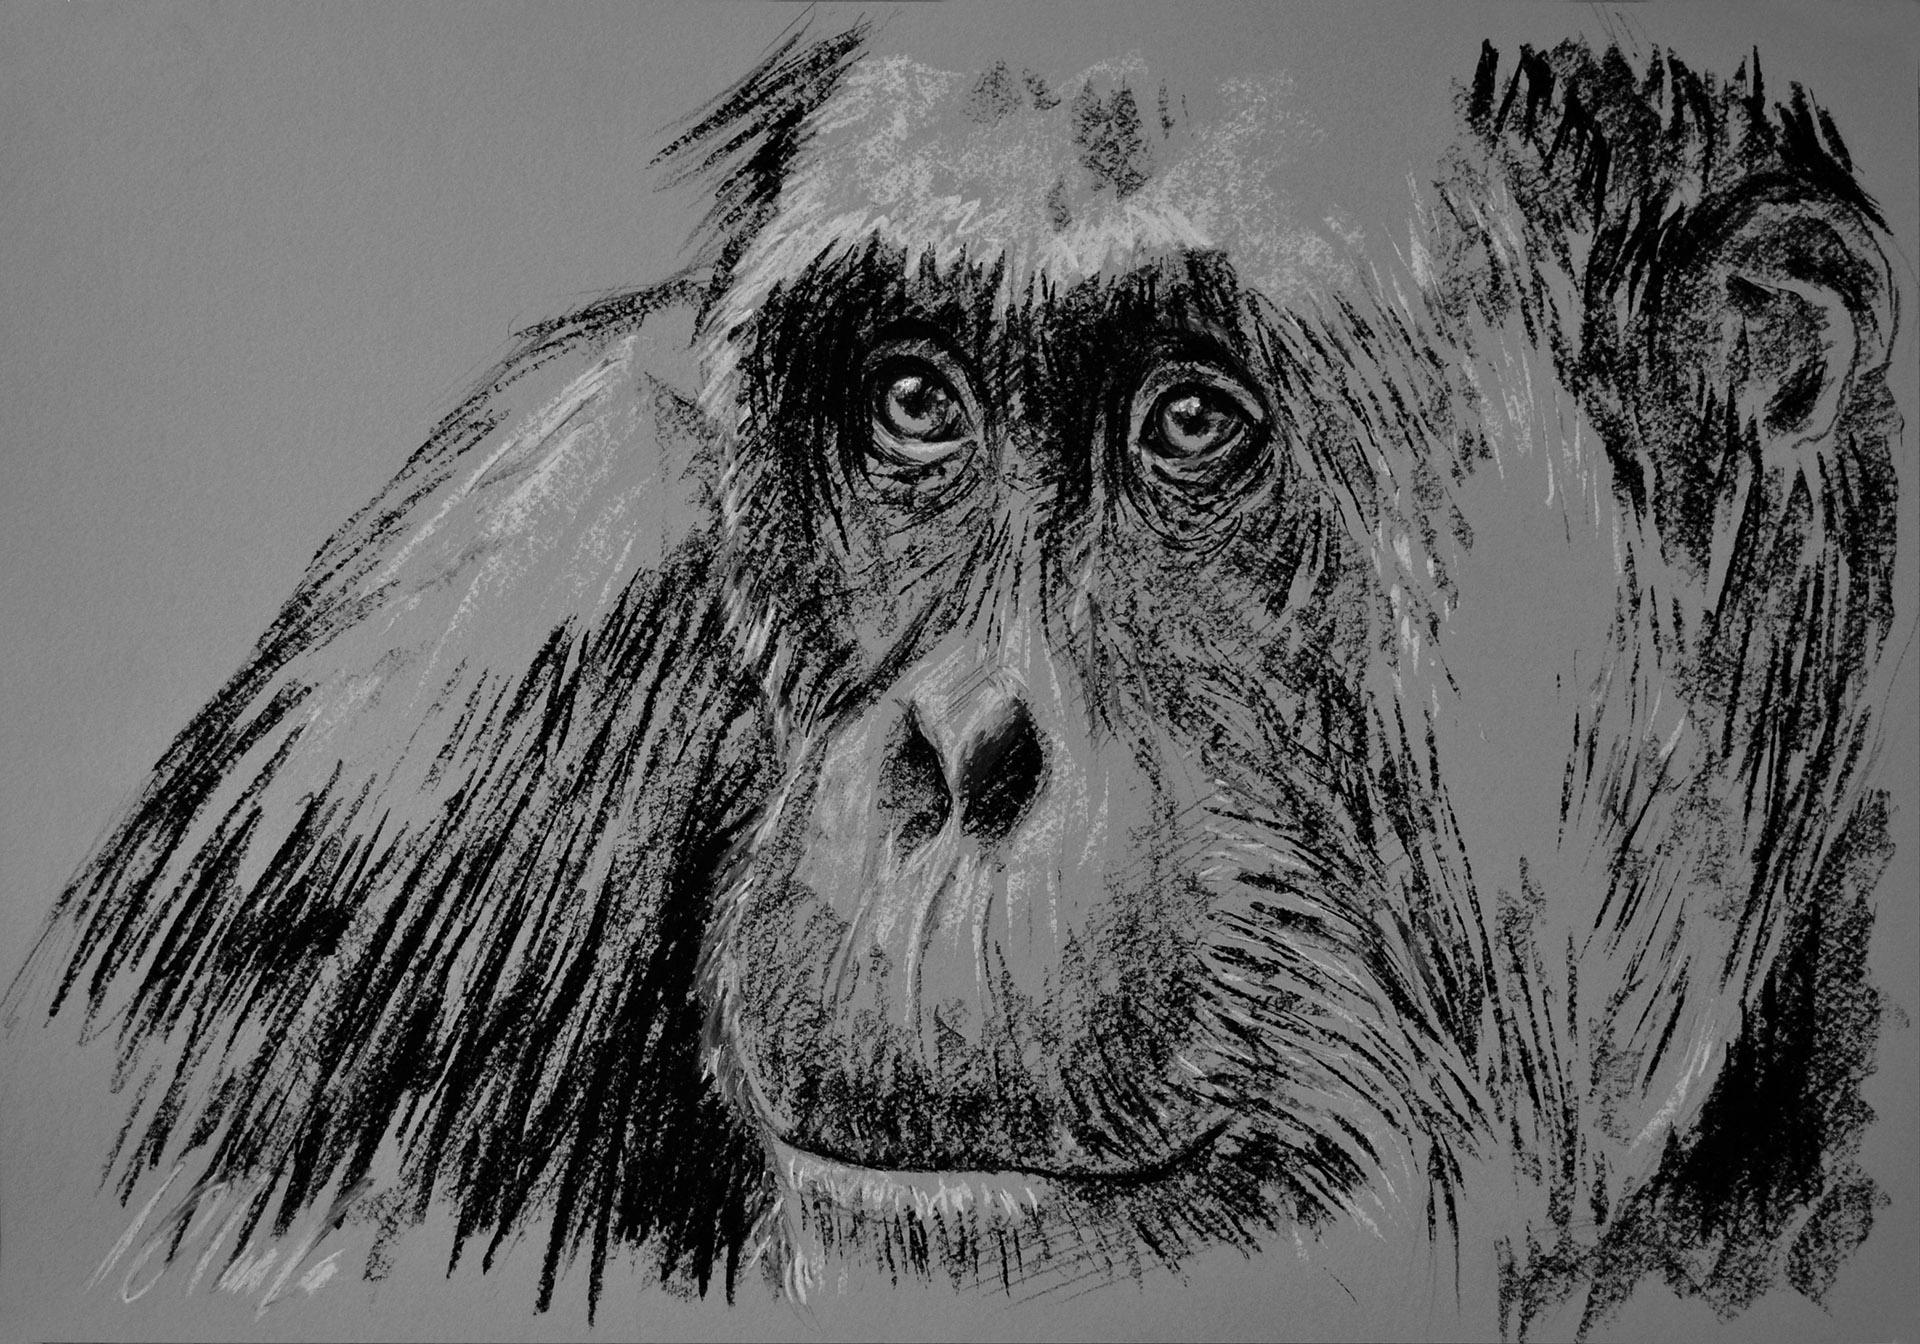 Orangután. Carboncillo, 50 x 35 cm. Javier Olmedo - 2013 -  PV 75 €